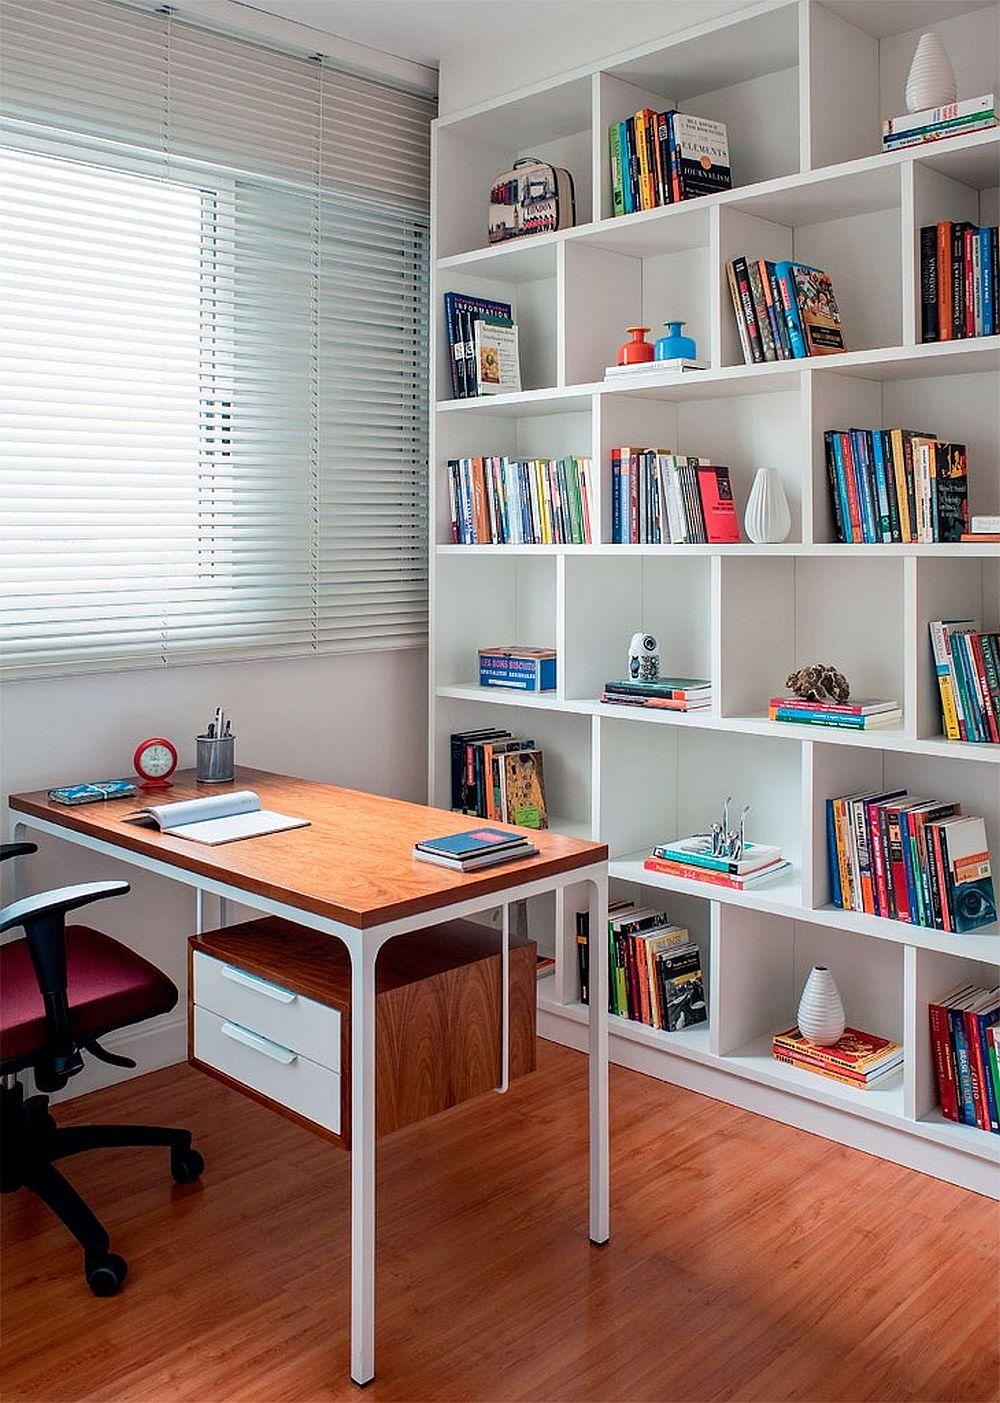 adelaparvu.com despre apartament de trei camere cu gratar pe balcon, designer Daniela Berardinelli (13)